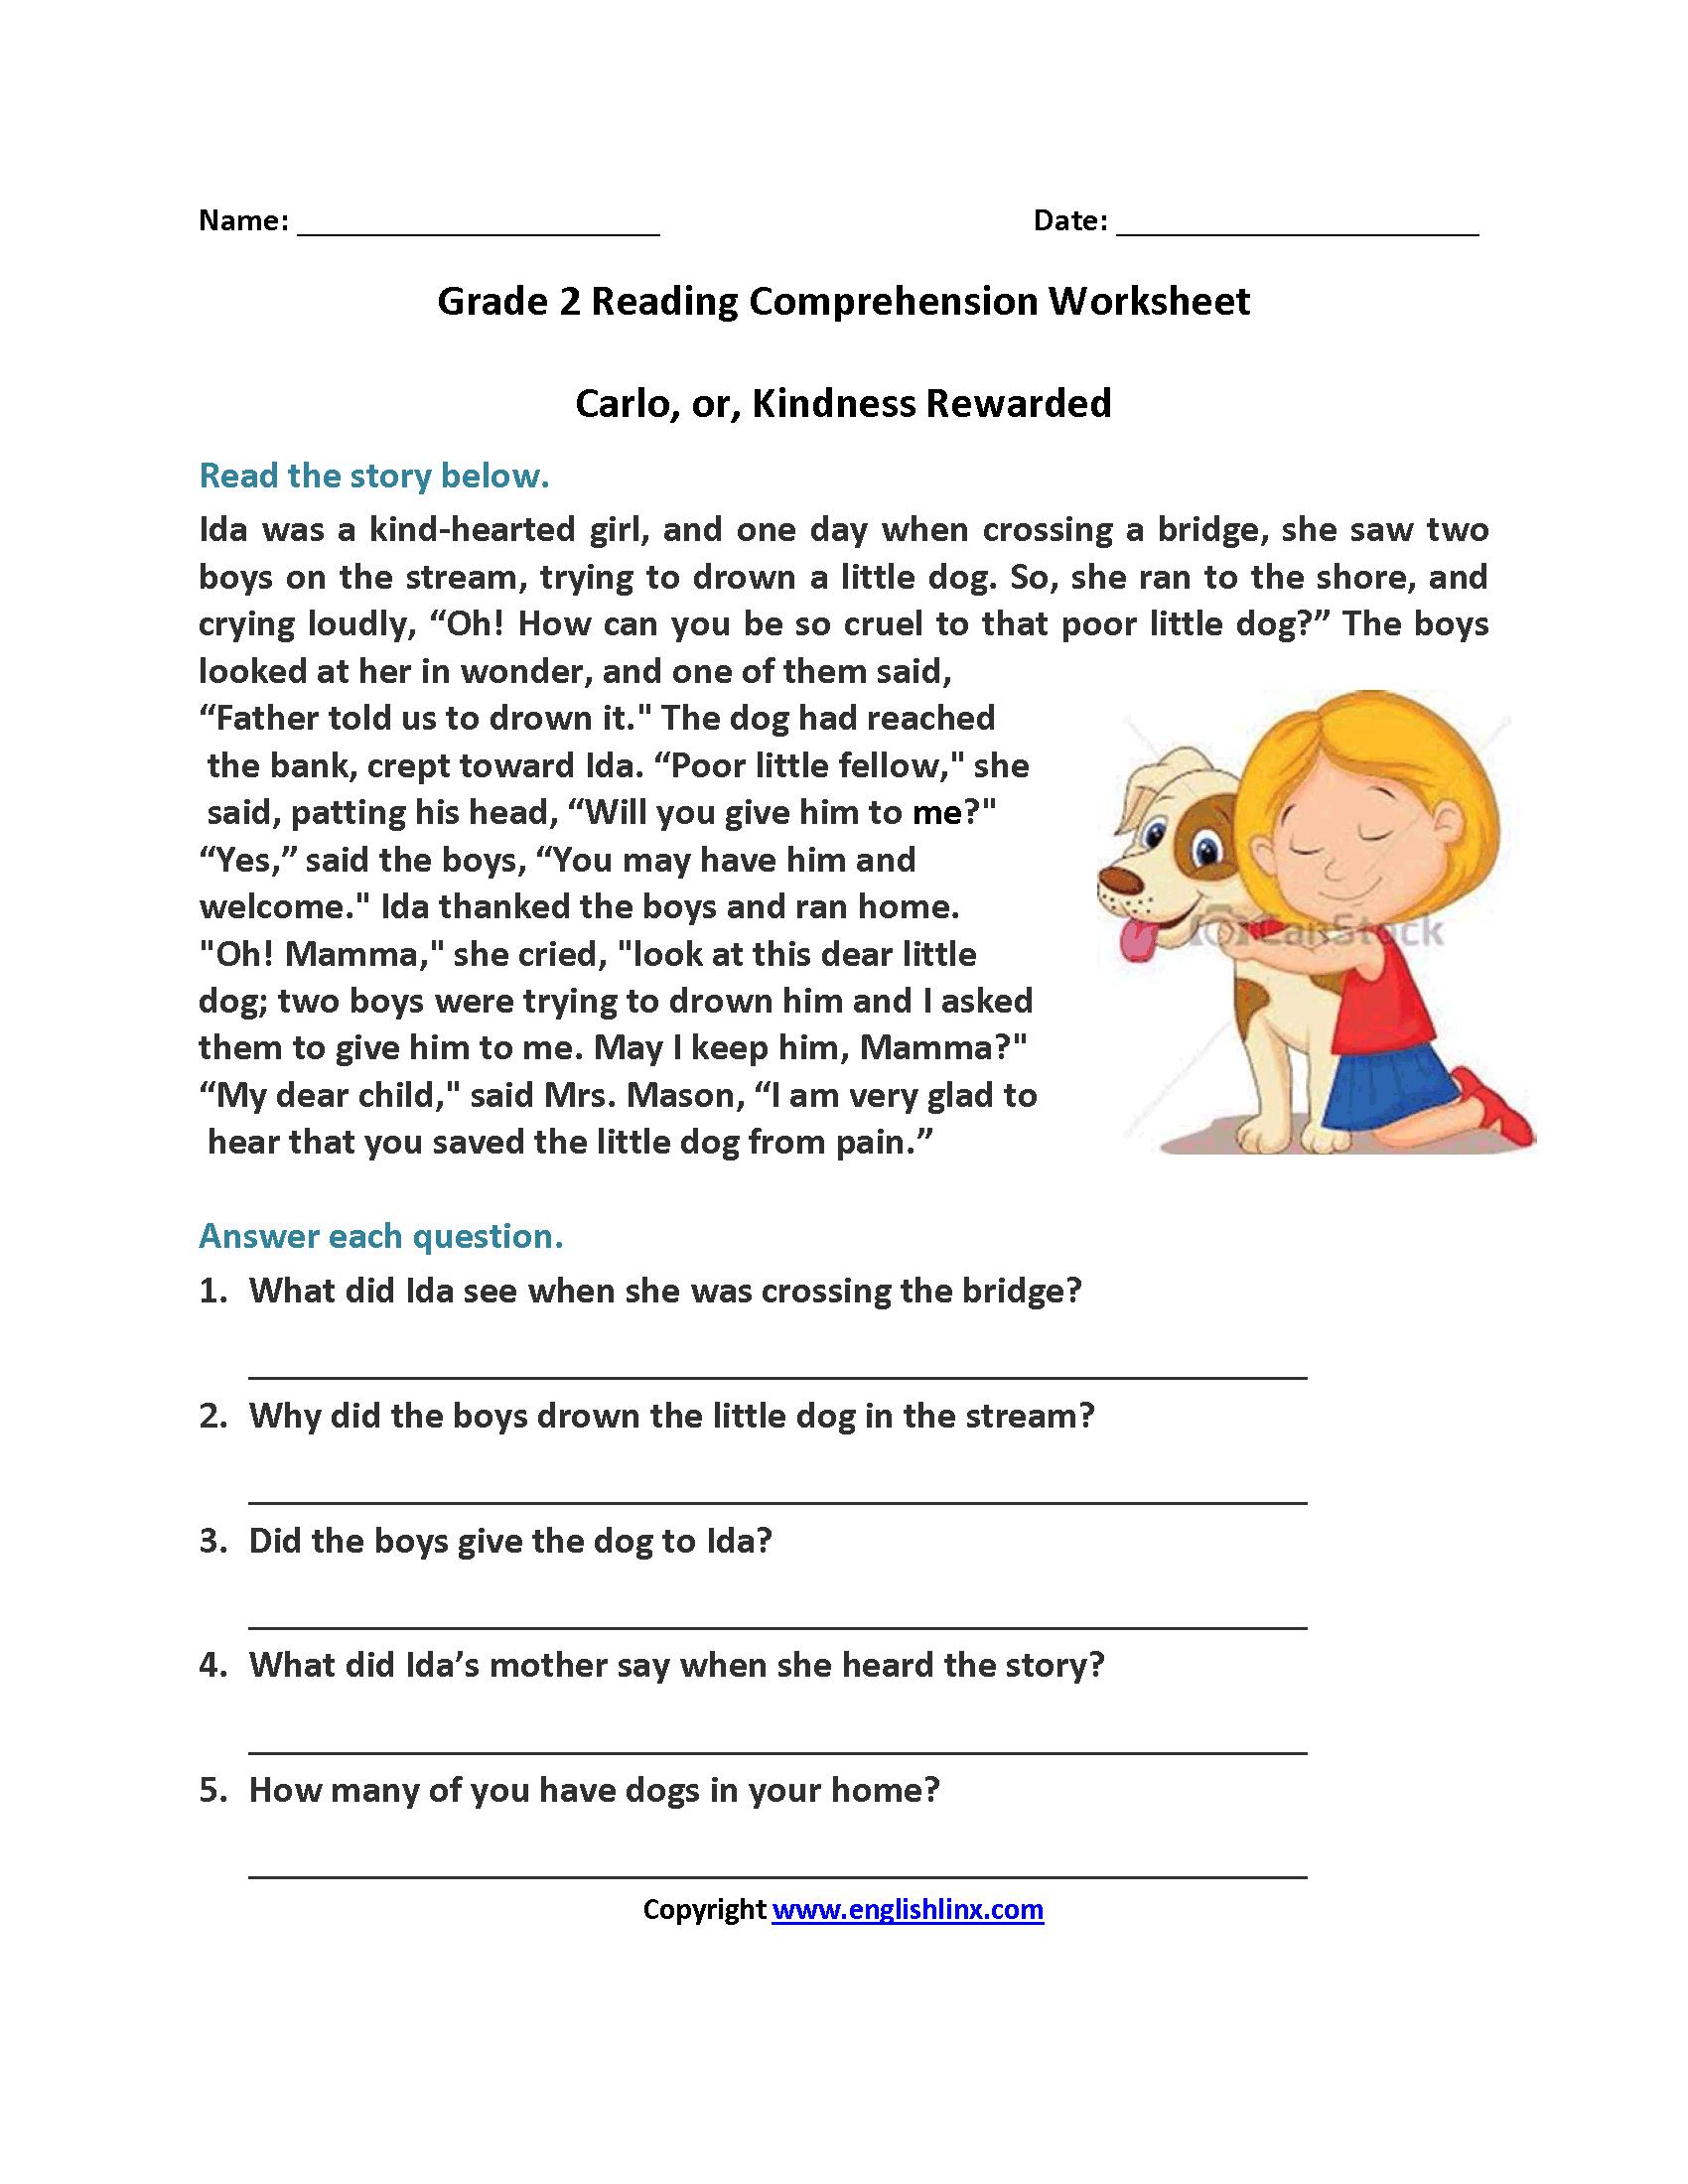 Carlo Or Kindness Rewarded Second Grade Reading Worksheets | Reading - Free Printable Reading Comprehension Worksheets Grade 5